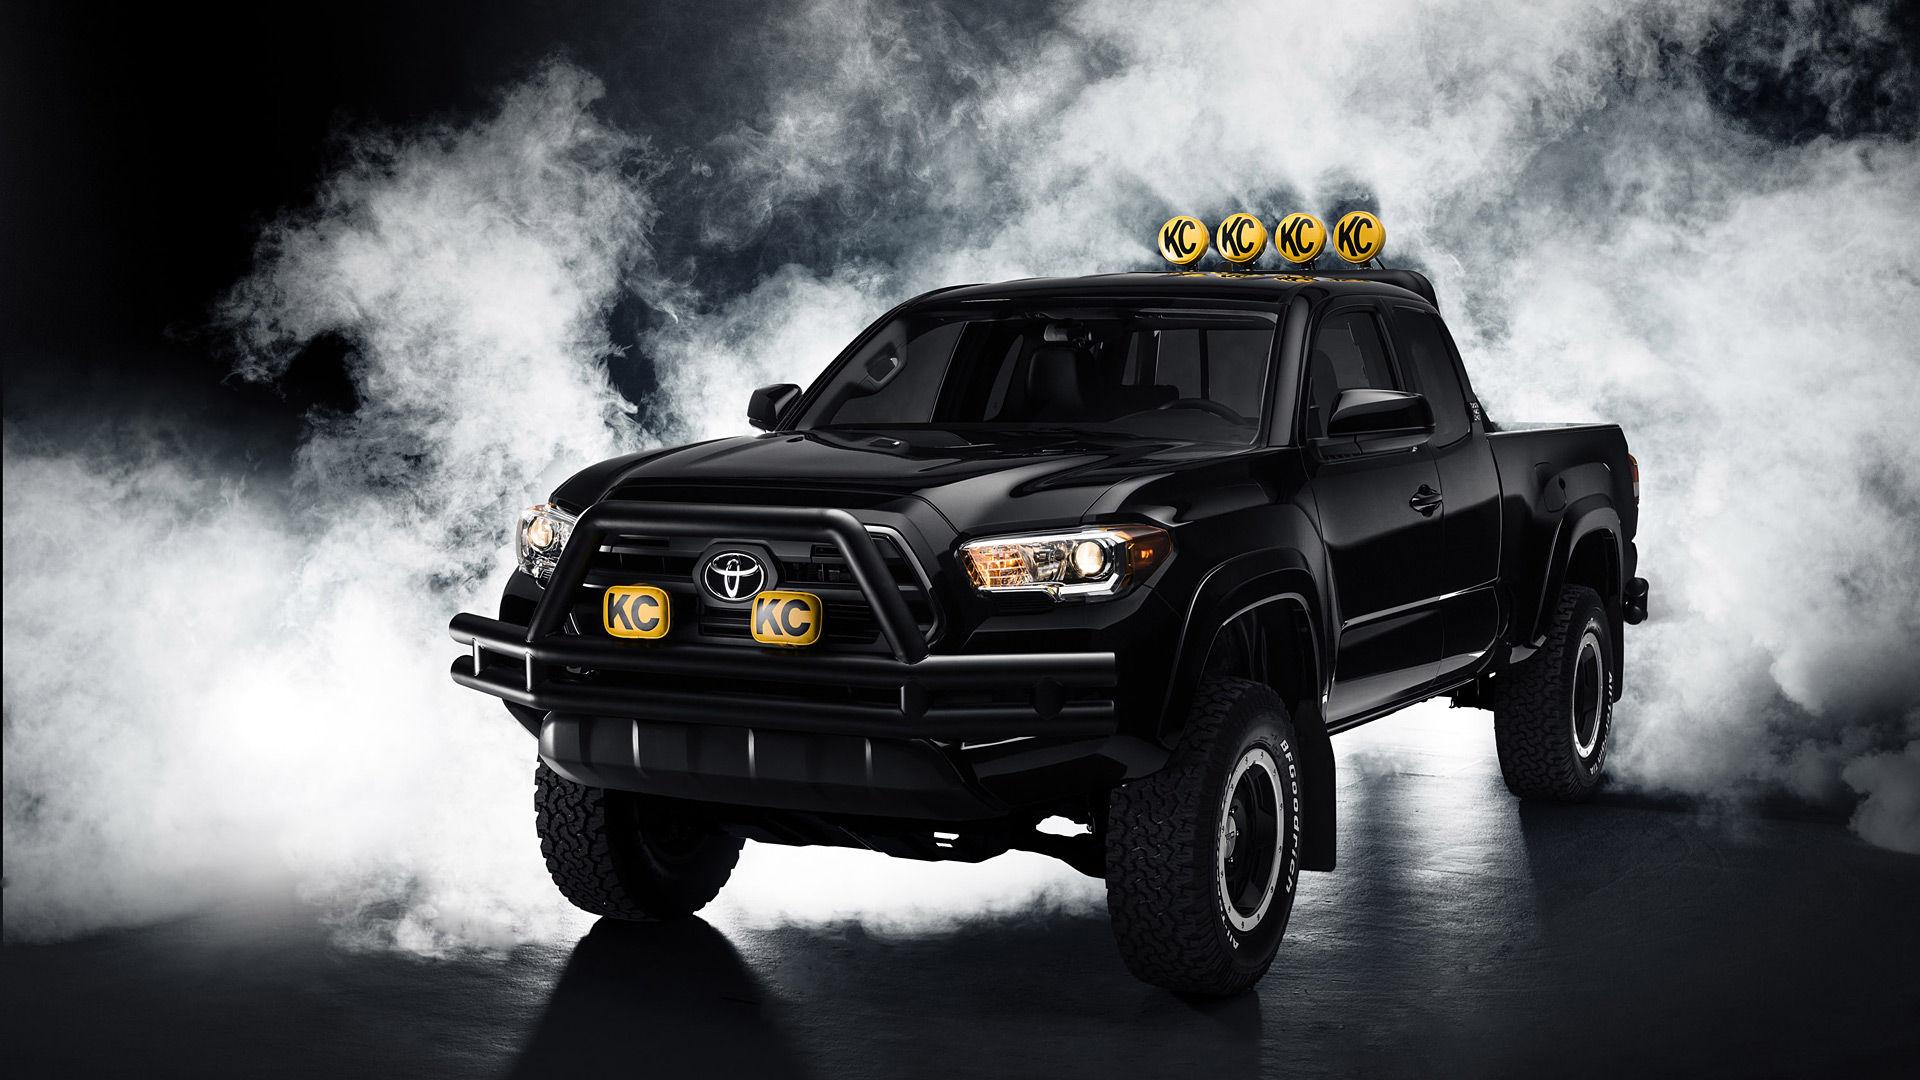 2016 Toyota Tacoma Back to the Future Concept